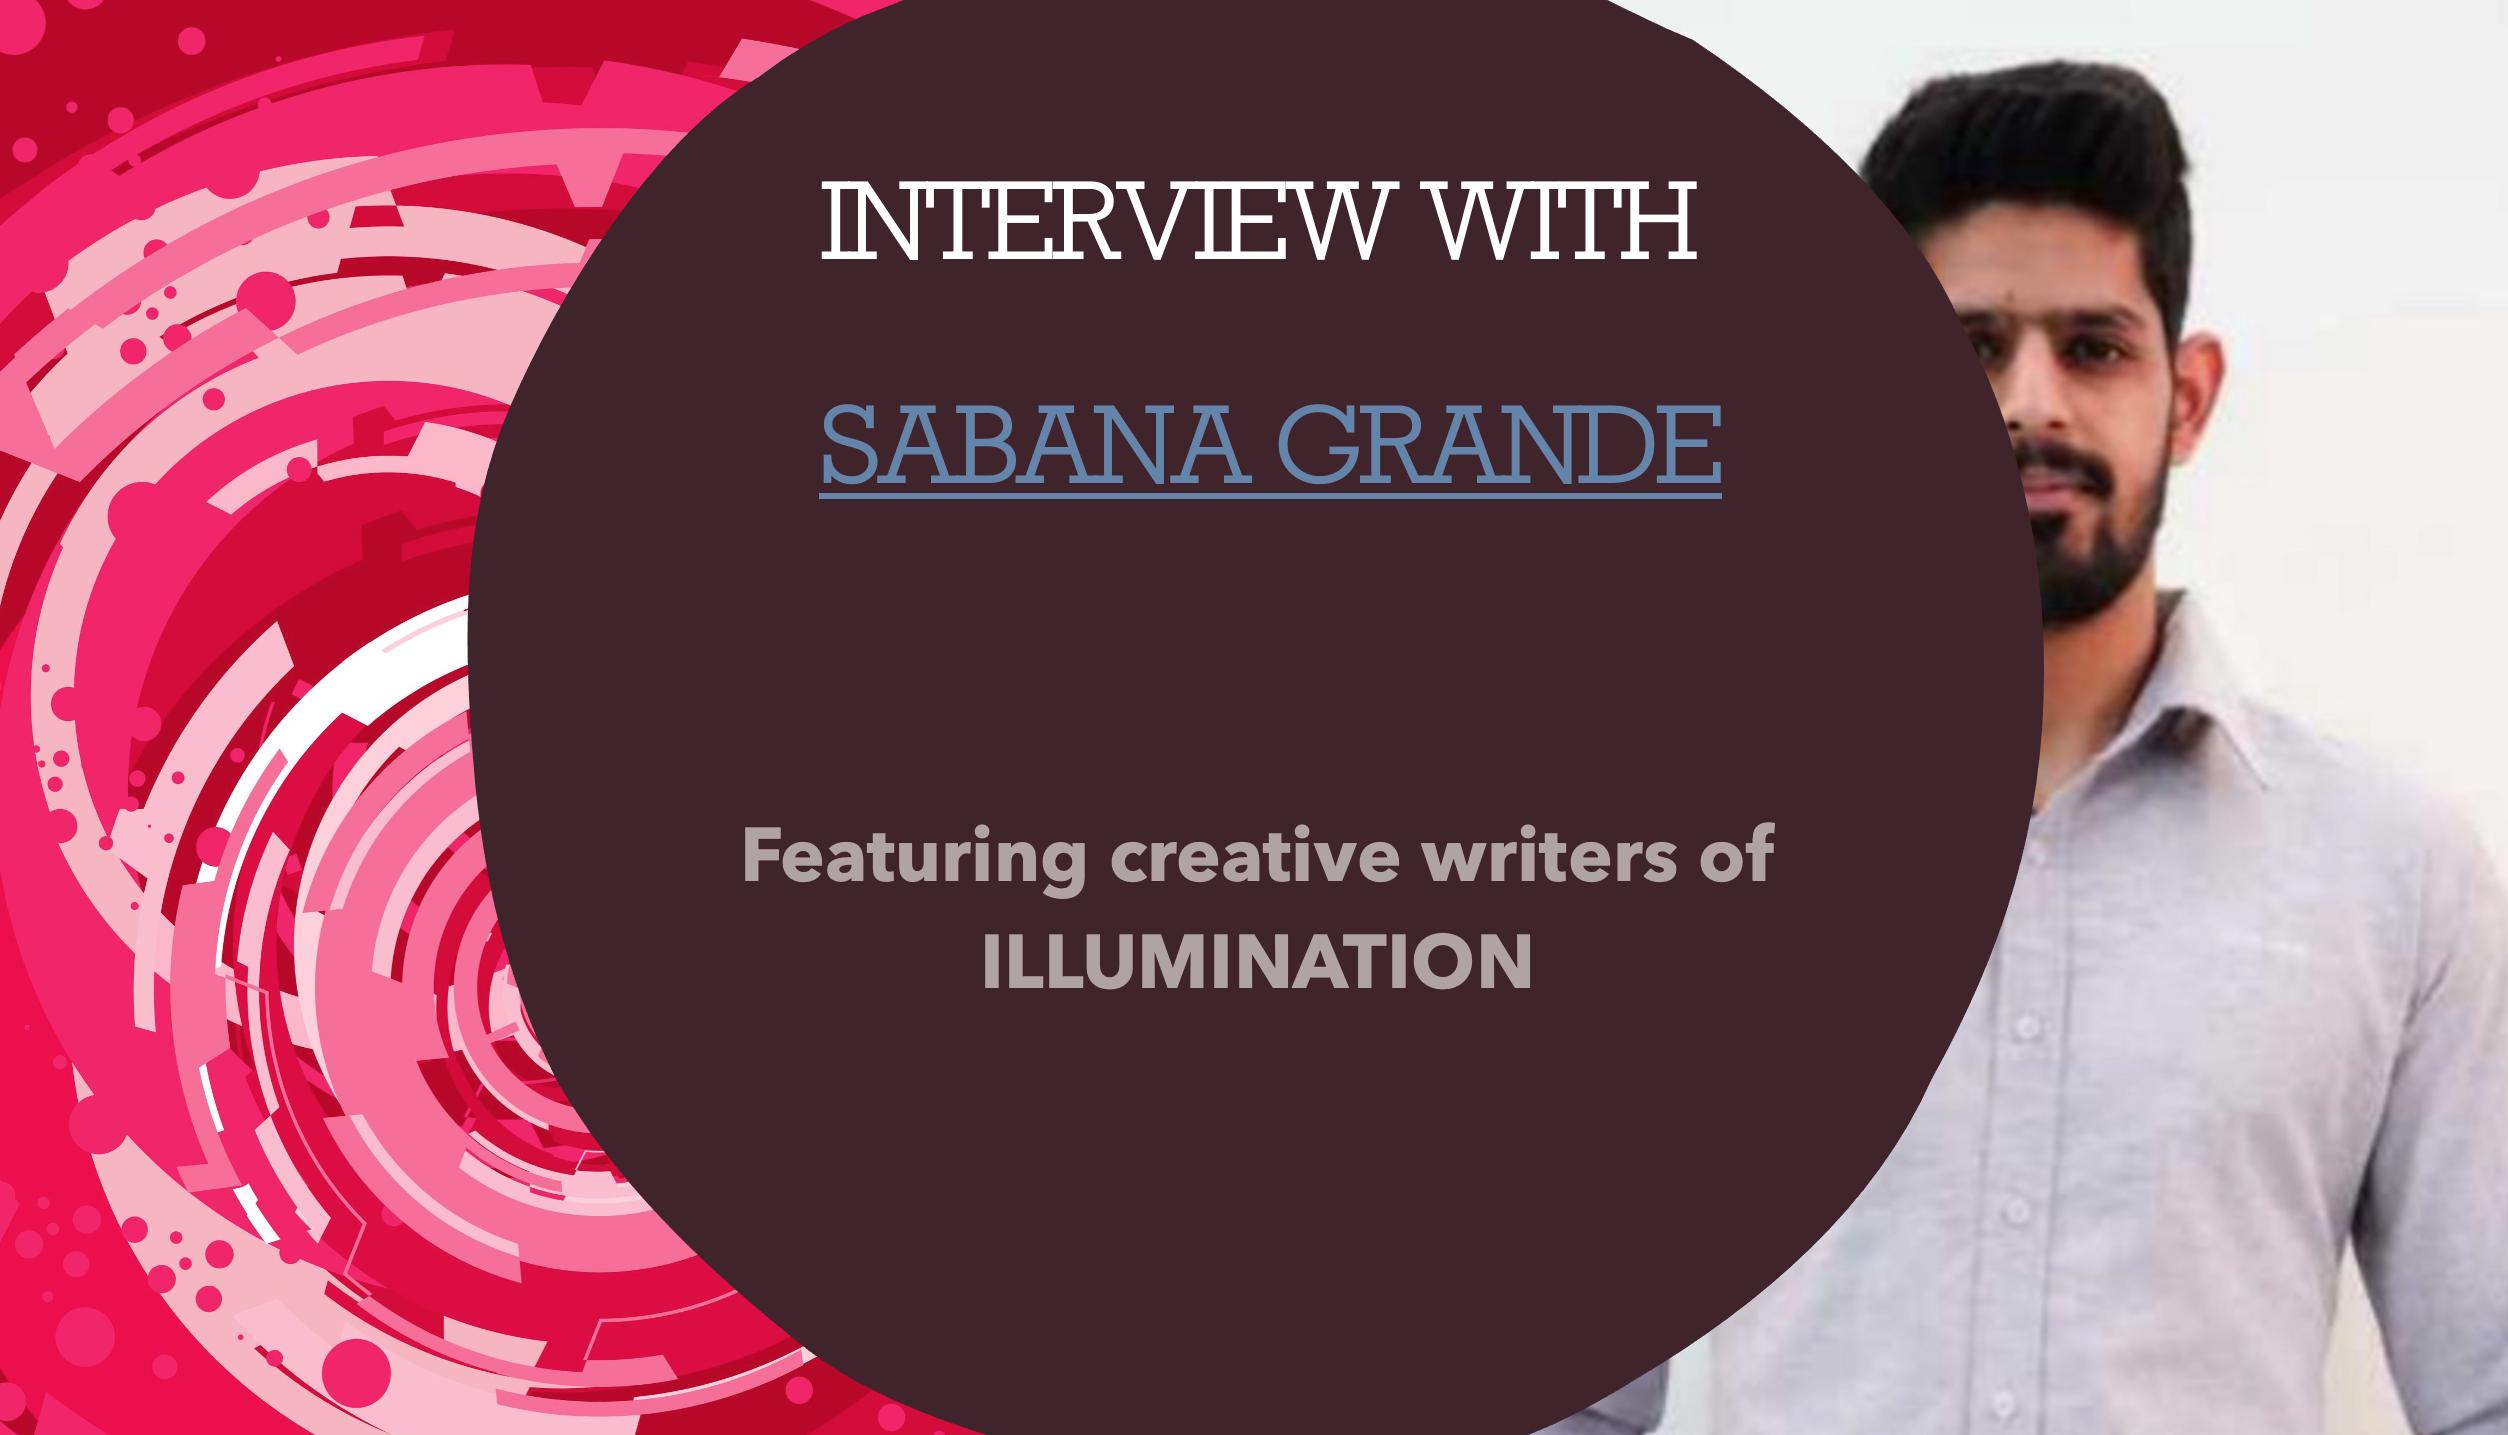 Interview with Sabana Grande Featuring creative writers of ILLUMINATION by Dr Mehmet Yildiz on ILLUMINATION—Medium